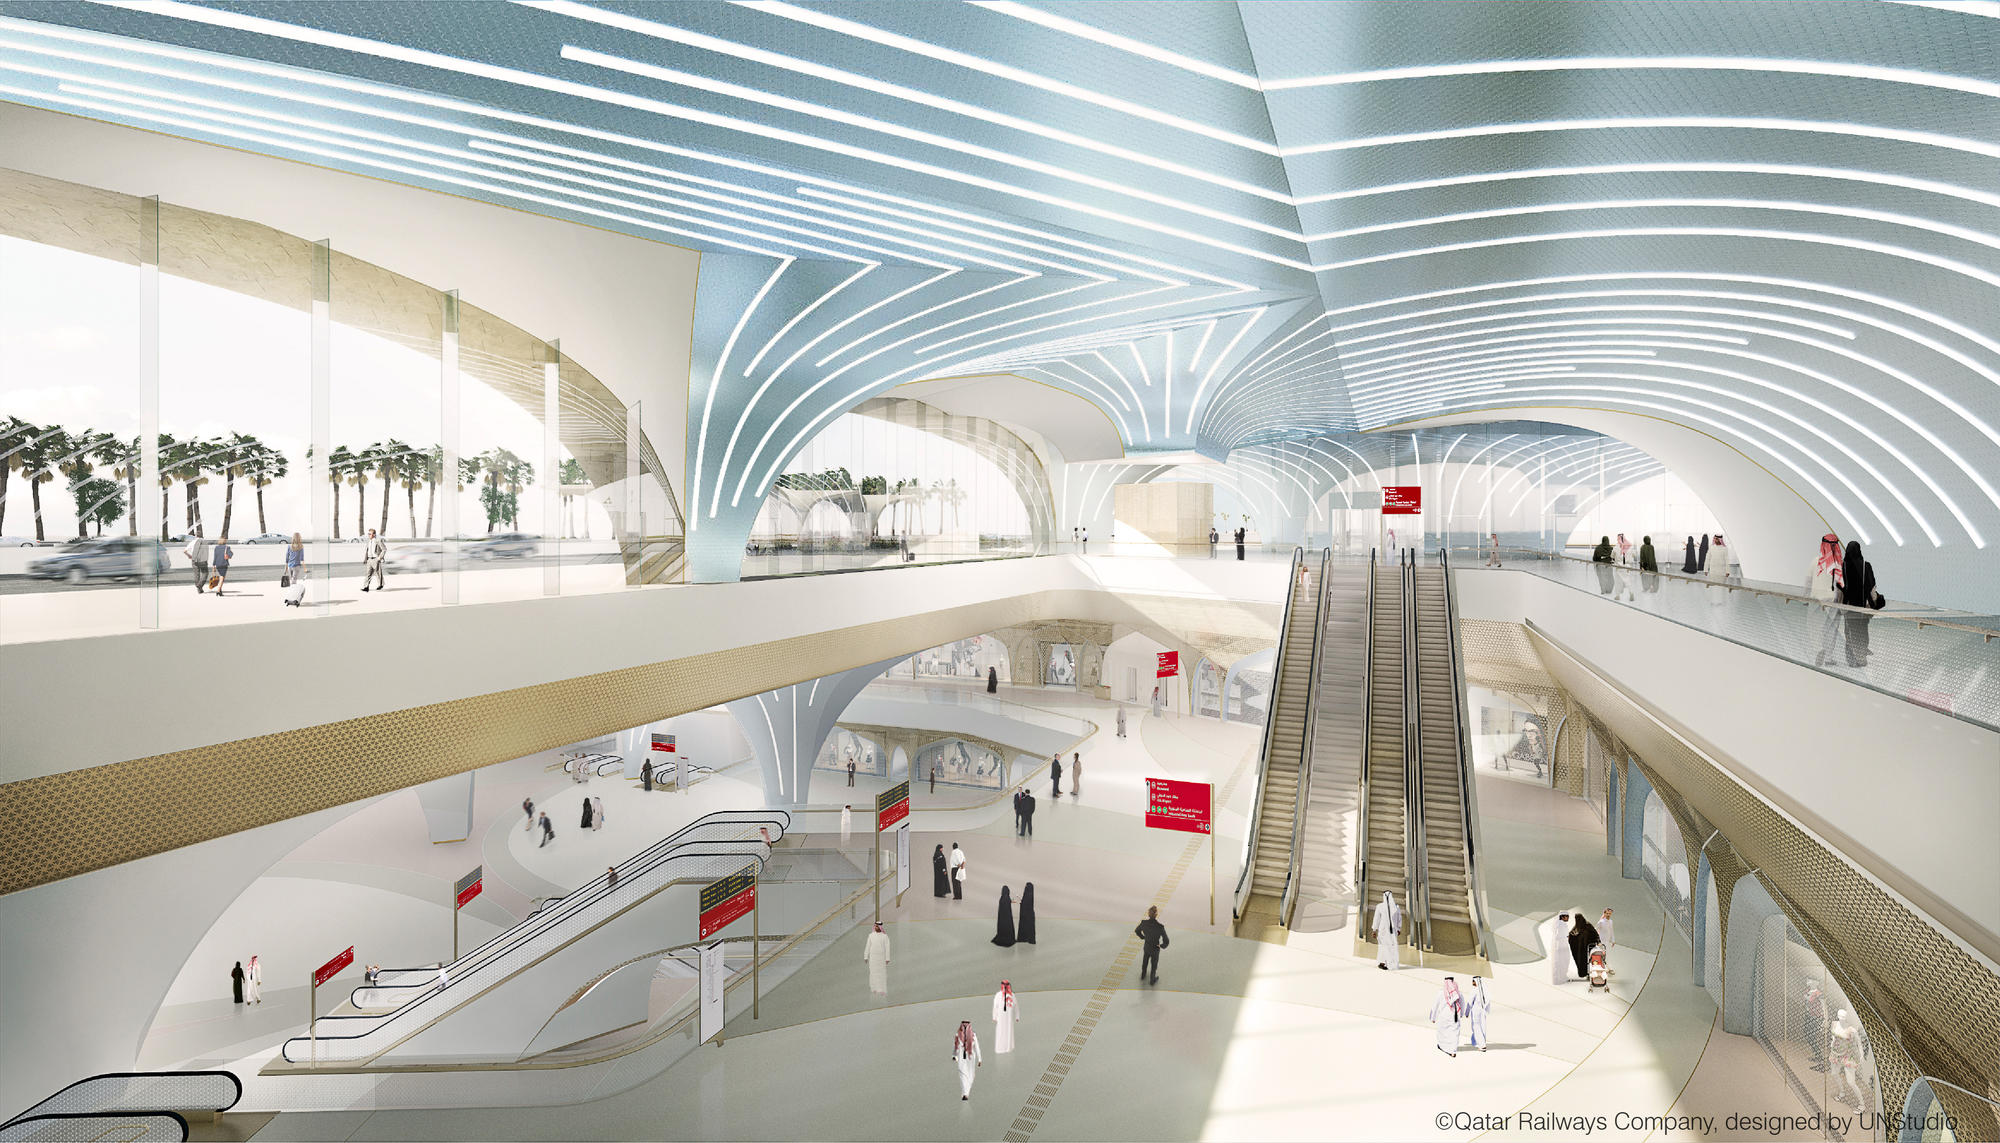 Qatar integrated railway project unstudio for Architecture companies qatar